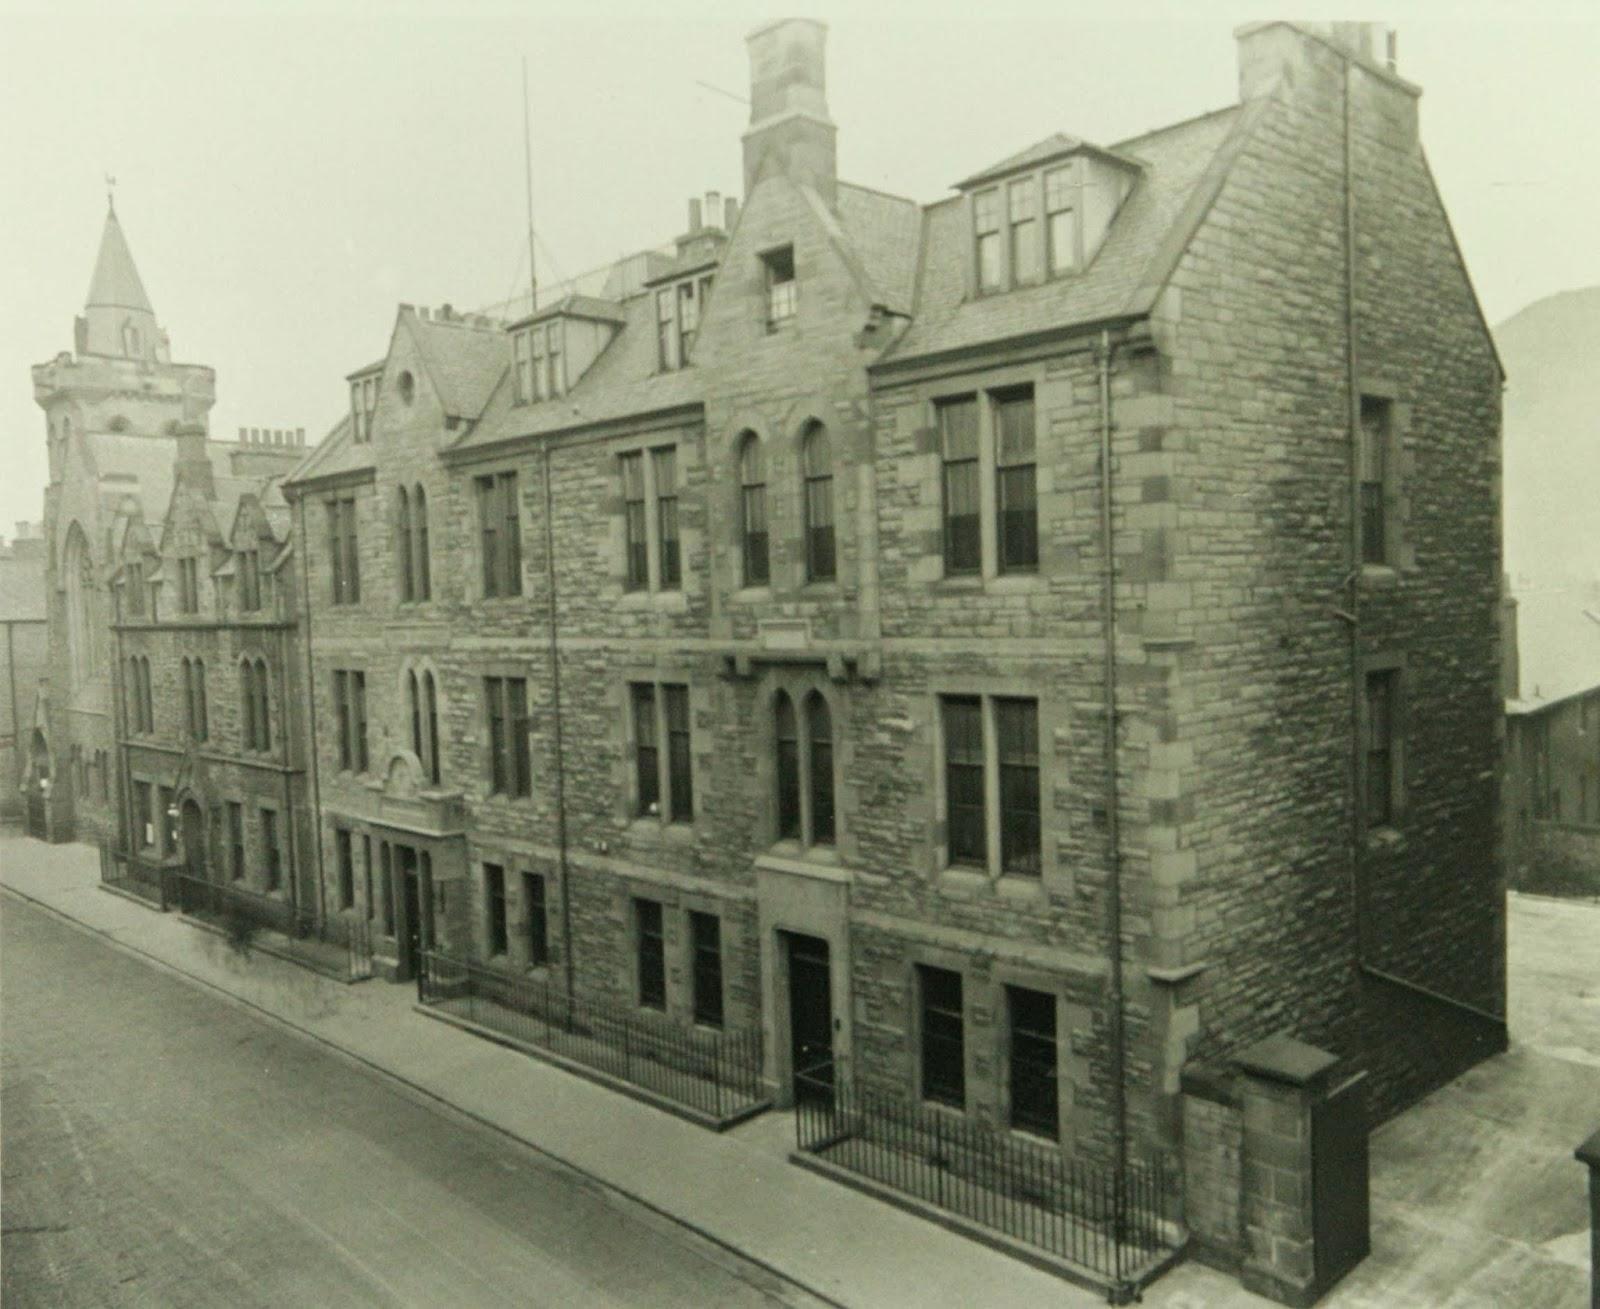 Deaconess Hospital in 1935